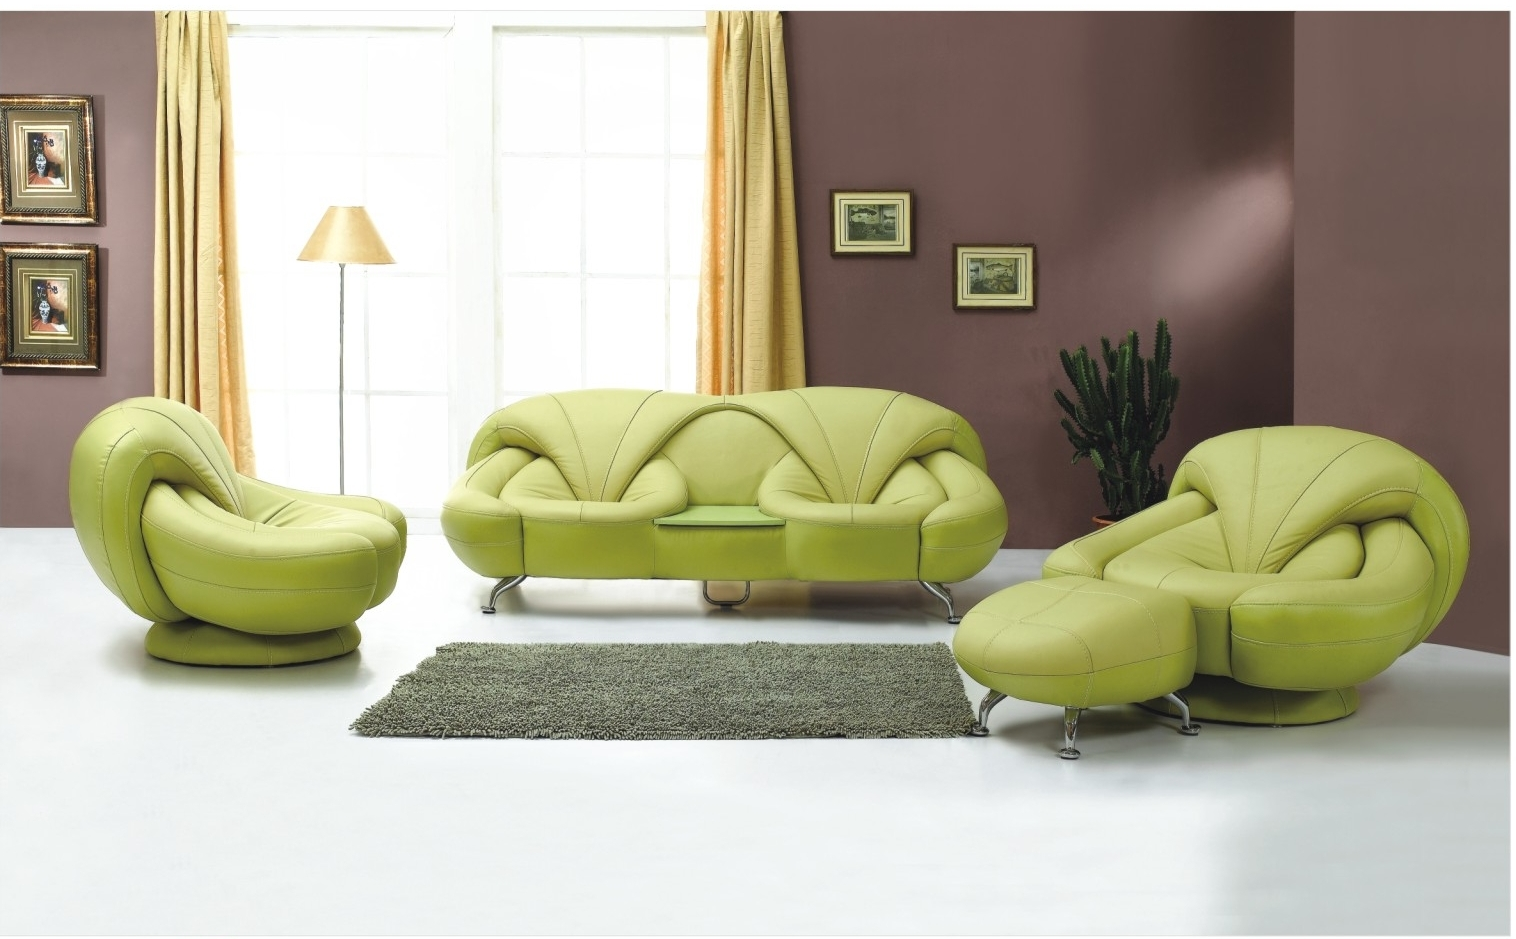 Modern living room furniture designs ideas. | An Interior ...